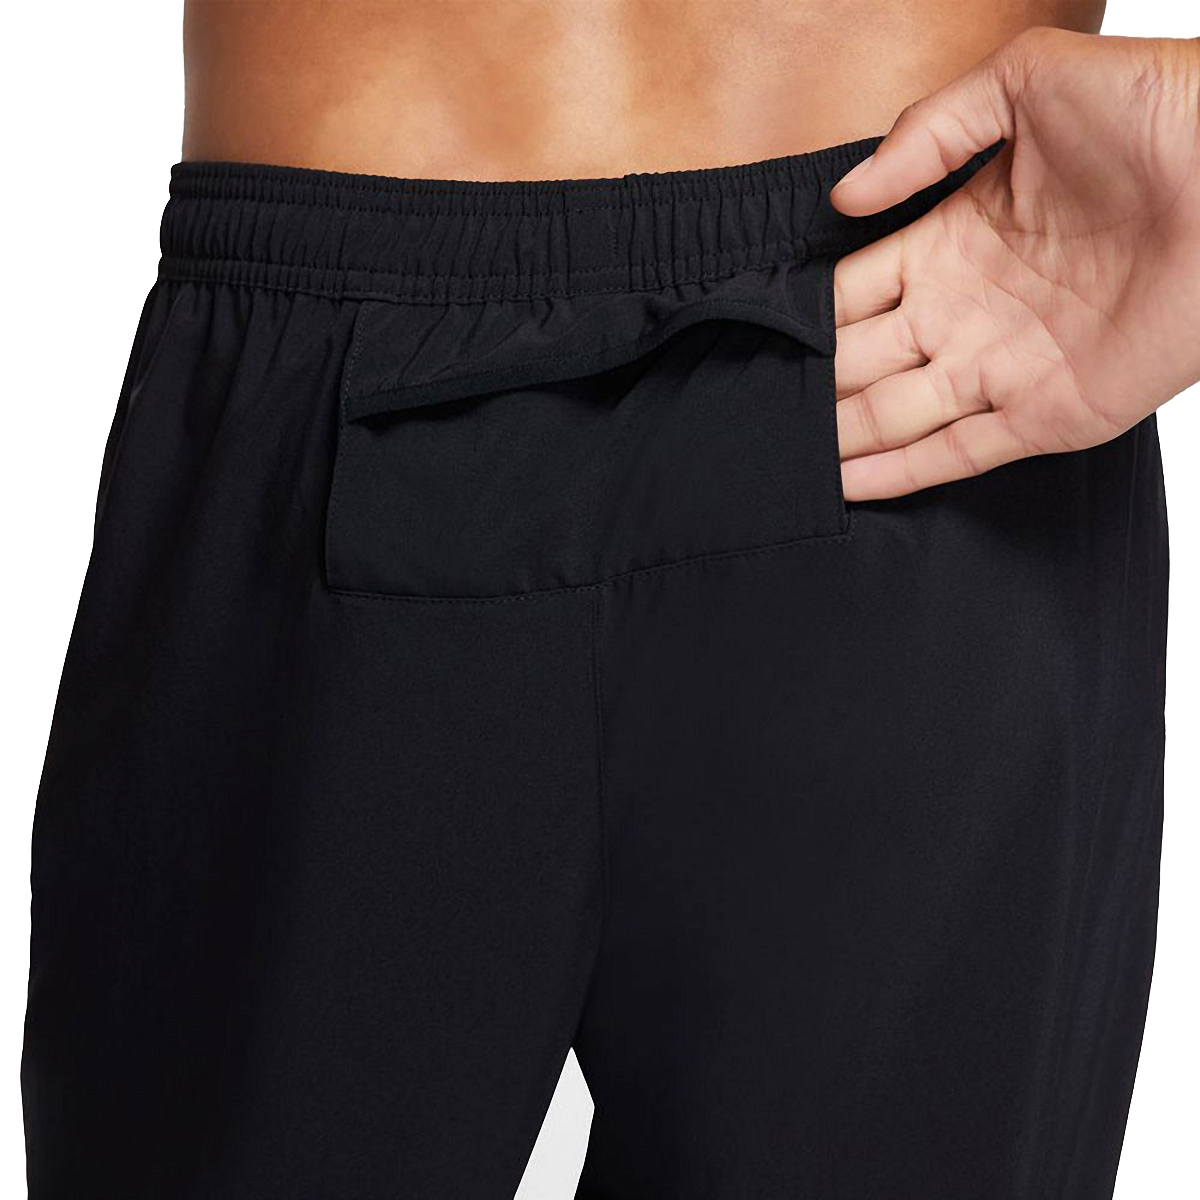 Men's Nike Phenom Essential Pant  - Color: Black/Reflective - Size: S, Black/Reflective, large, image 3